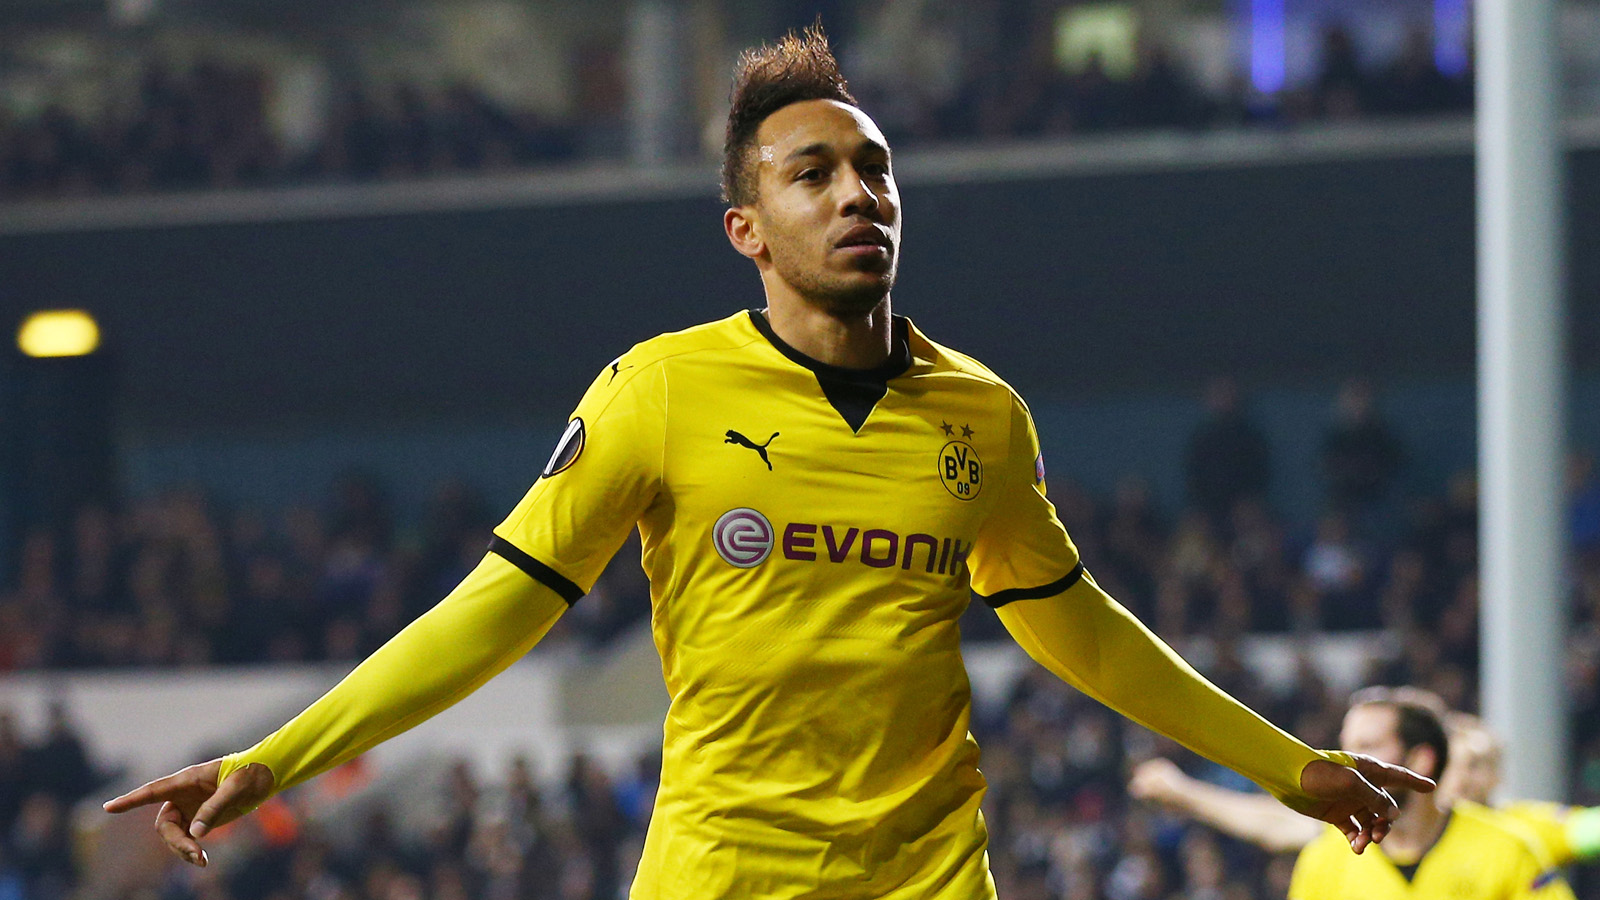 Manchester City in for $87m Dortmund star Aubameyang